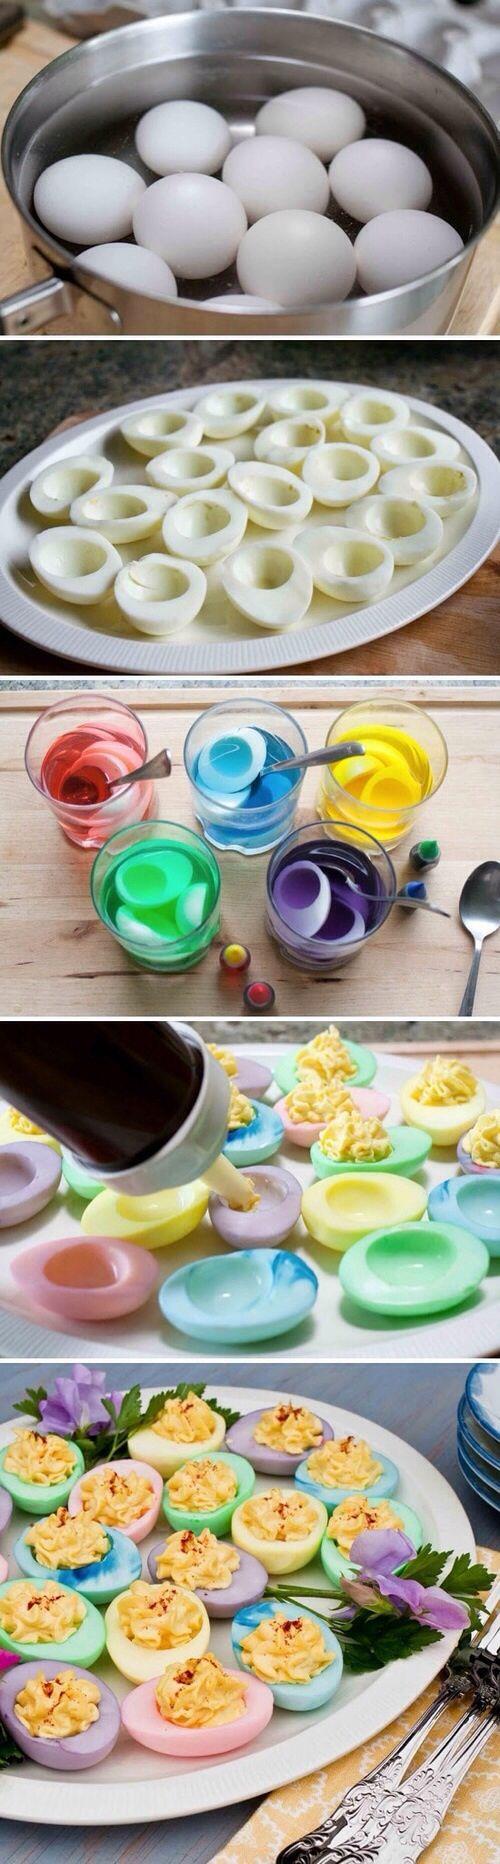 Food colouring eggs